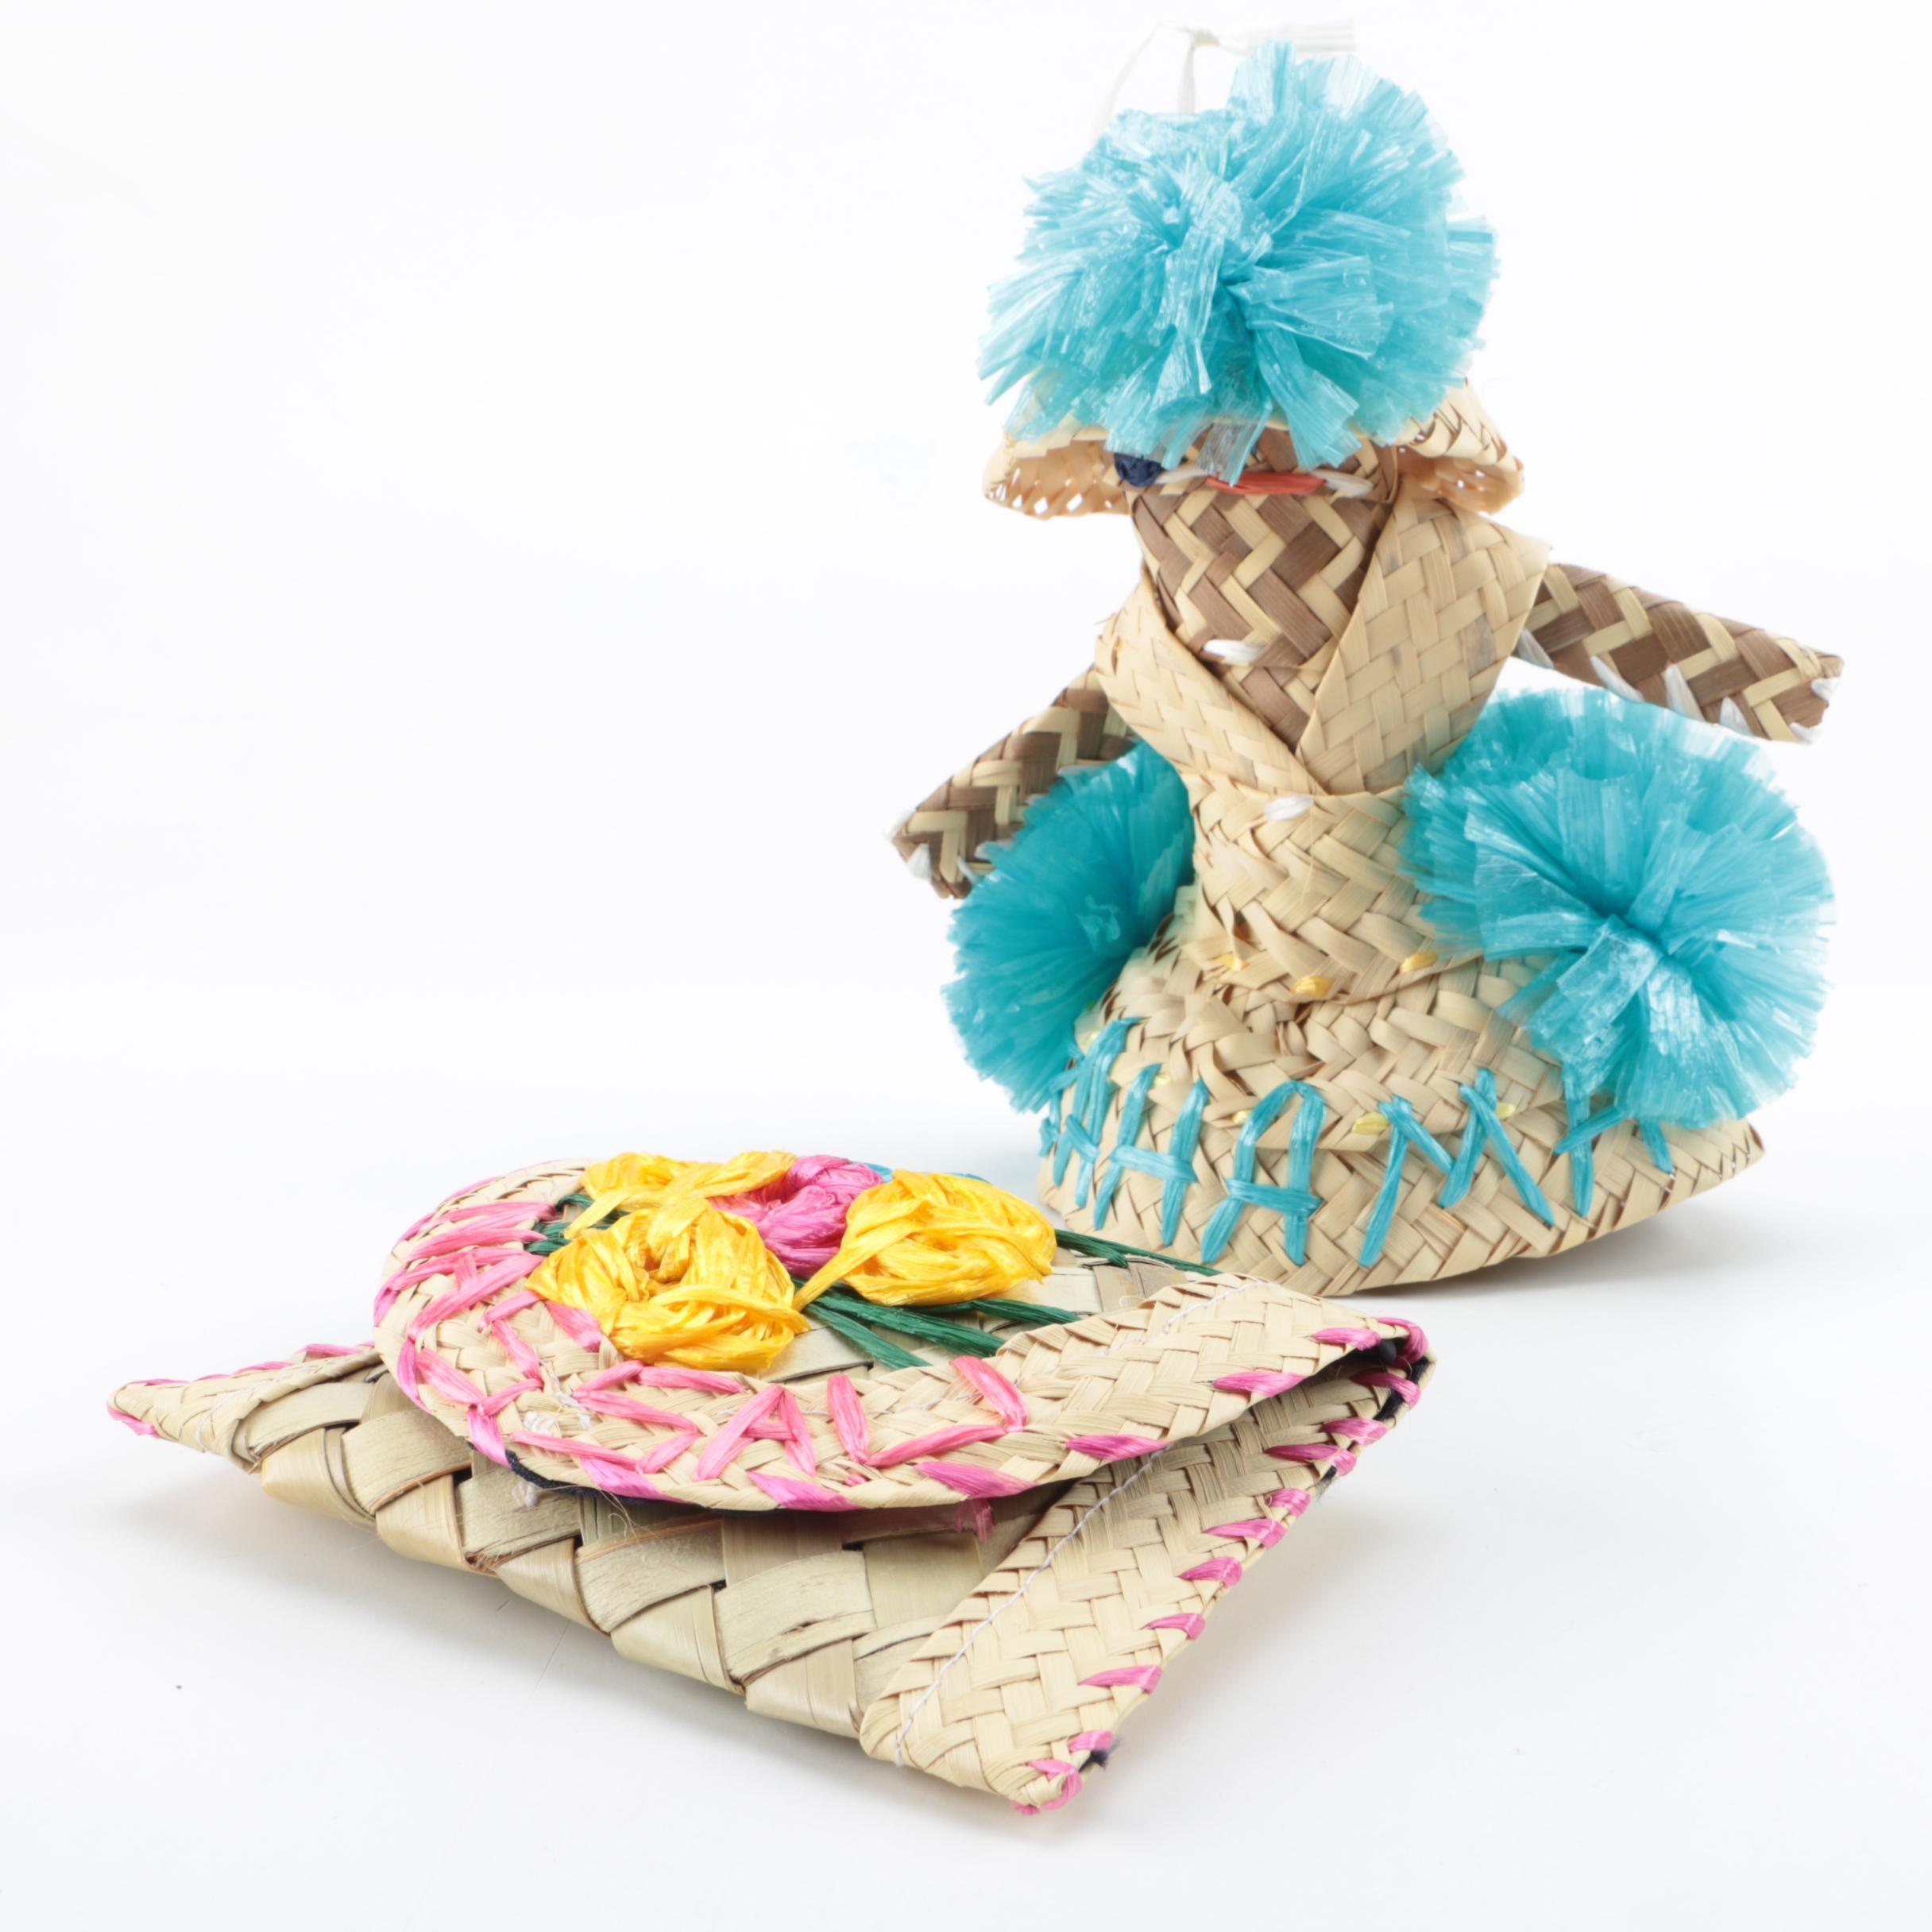 Bahamian Hand Woven Souvenir Doll and Wallet